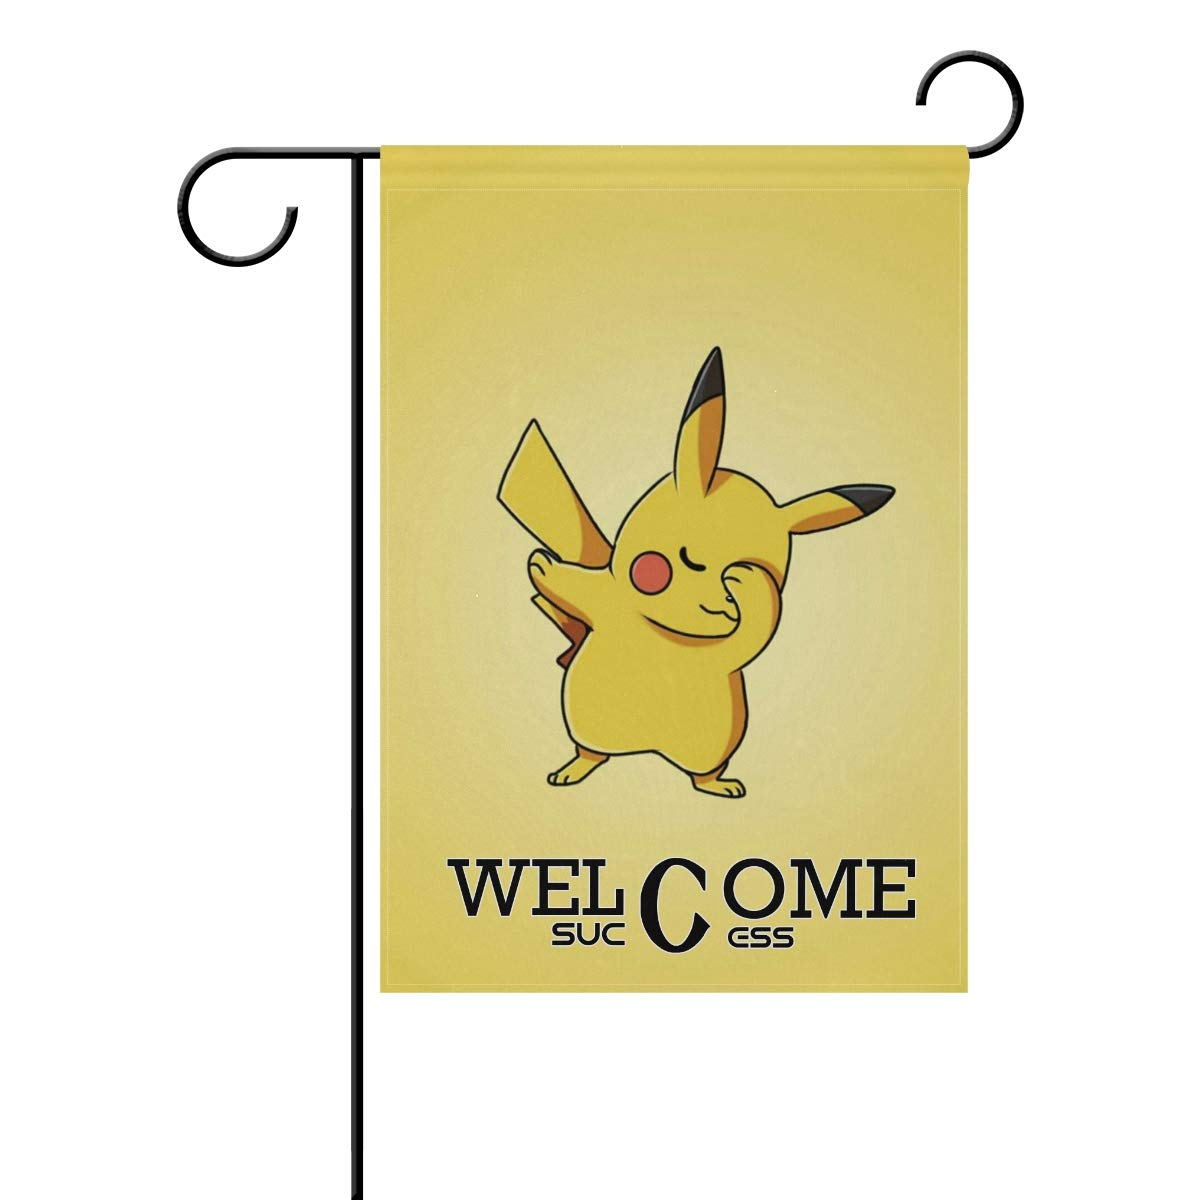 Amazon.com: AfdsaswfvsJ Pikachu Forma Cool Yeah Cartoon ...